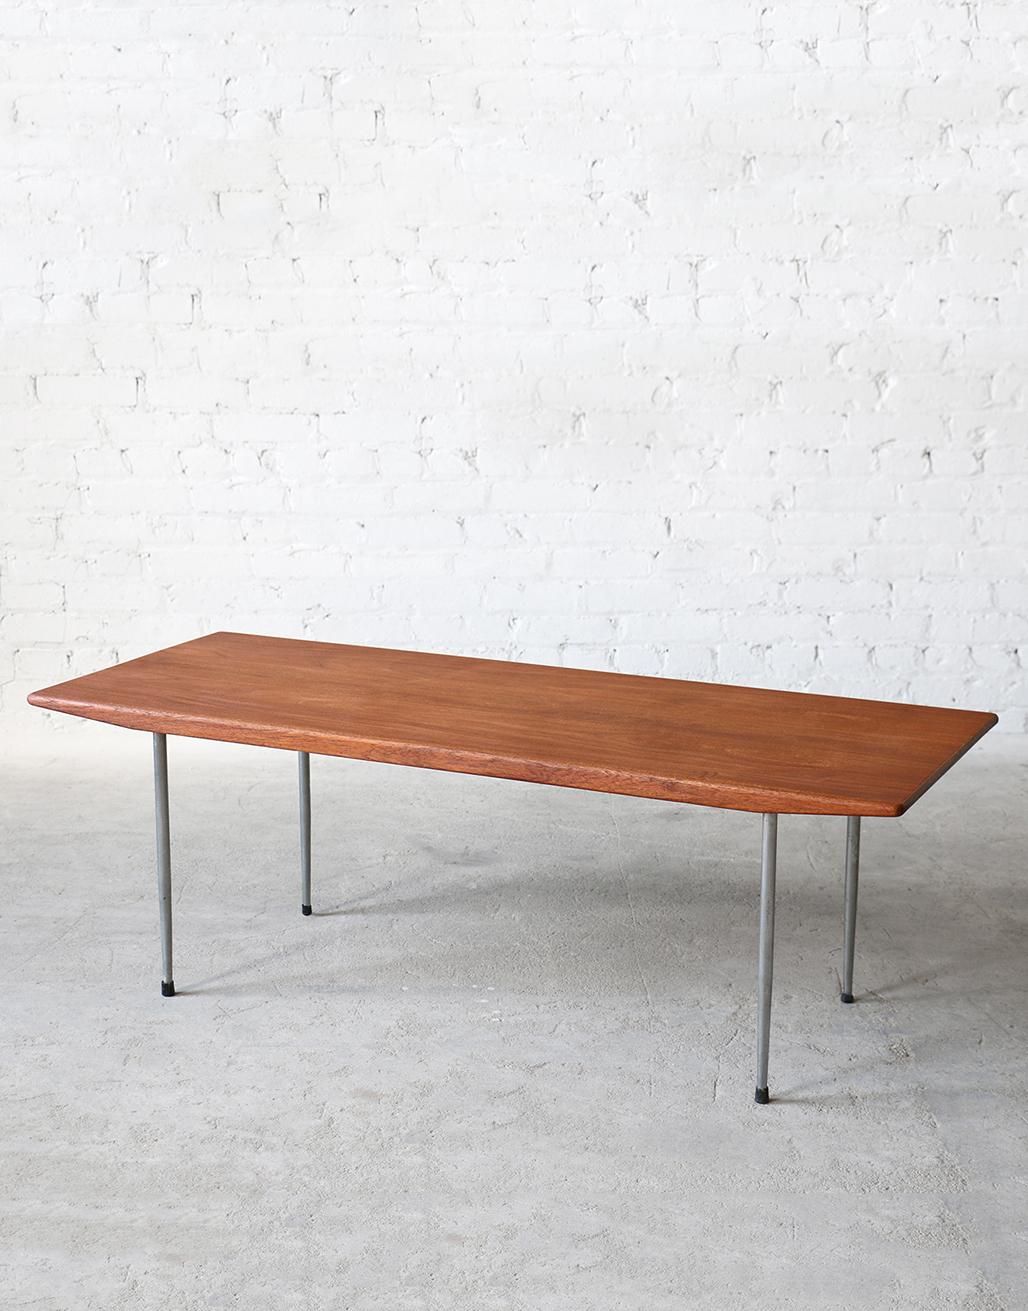 Tage Kristensen Teak Coffee Table